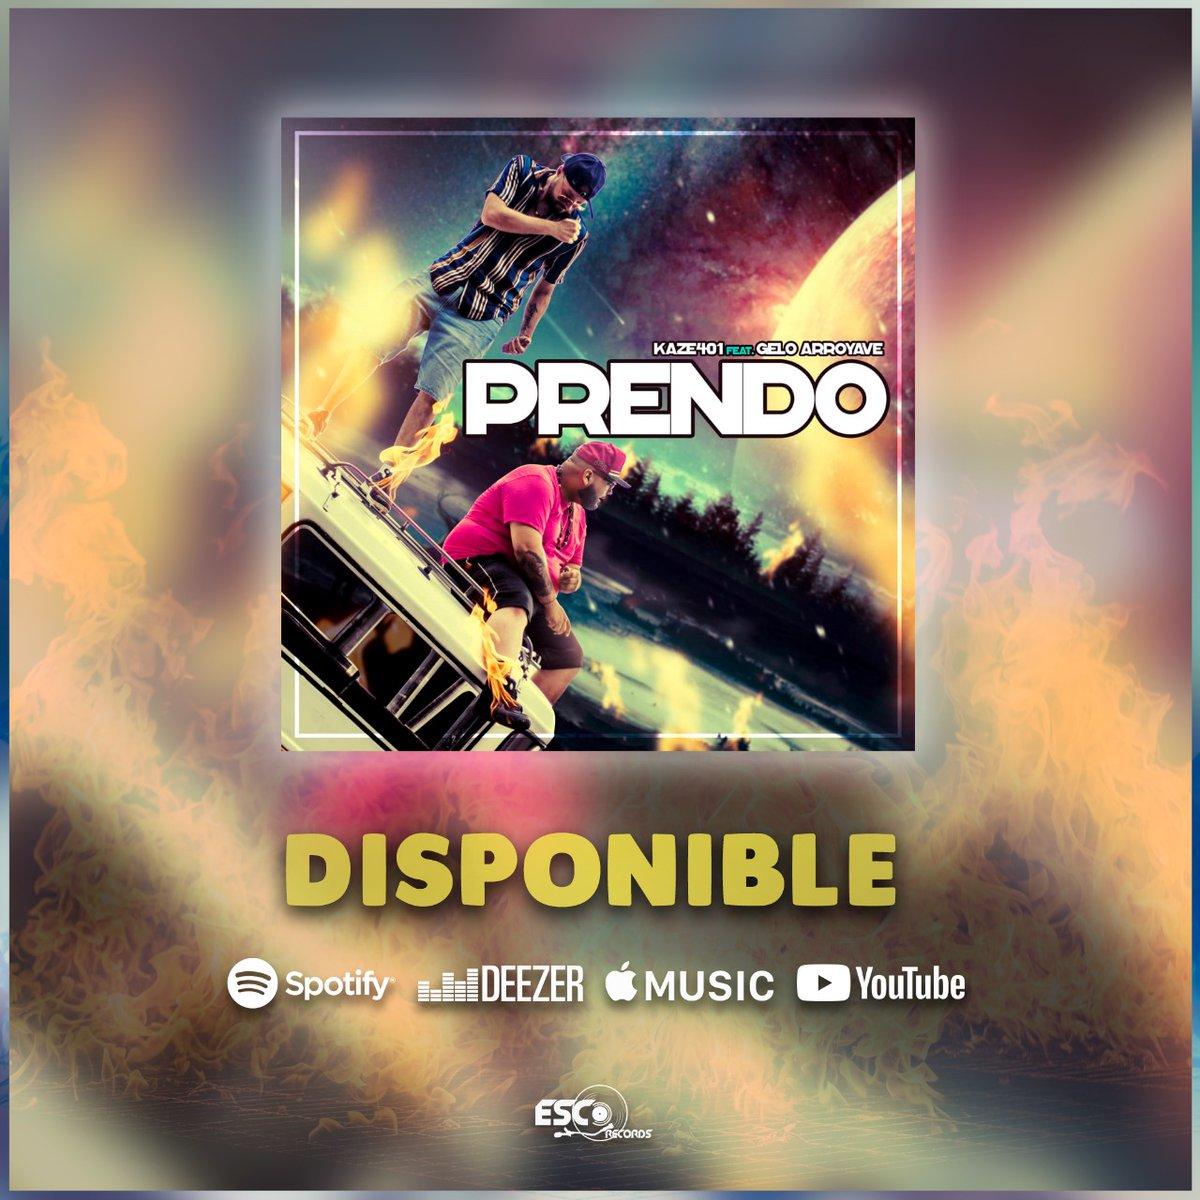 Recuerda que puedes disfrutar de #Prendo en las diferentes plataformas digitales #Spotify #Deezer #Itunes #OneRPM #YoutubeMusic  http://bit.ly/PrendoKaze  #EscoRecords #Kaze401 #GeloArroyavepic.twitter.com/ZdXkYiLPEw